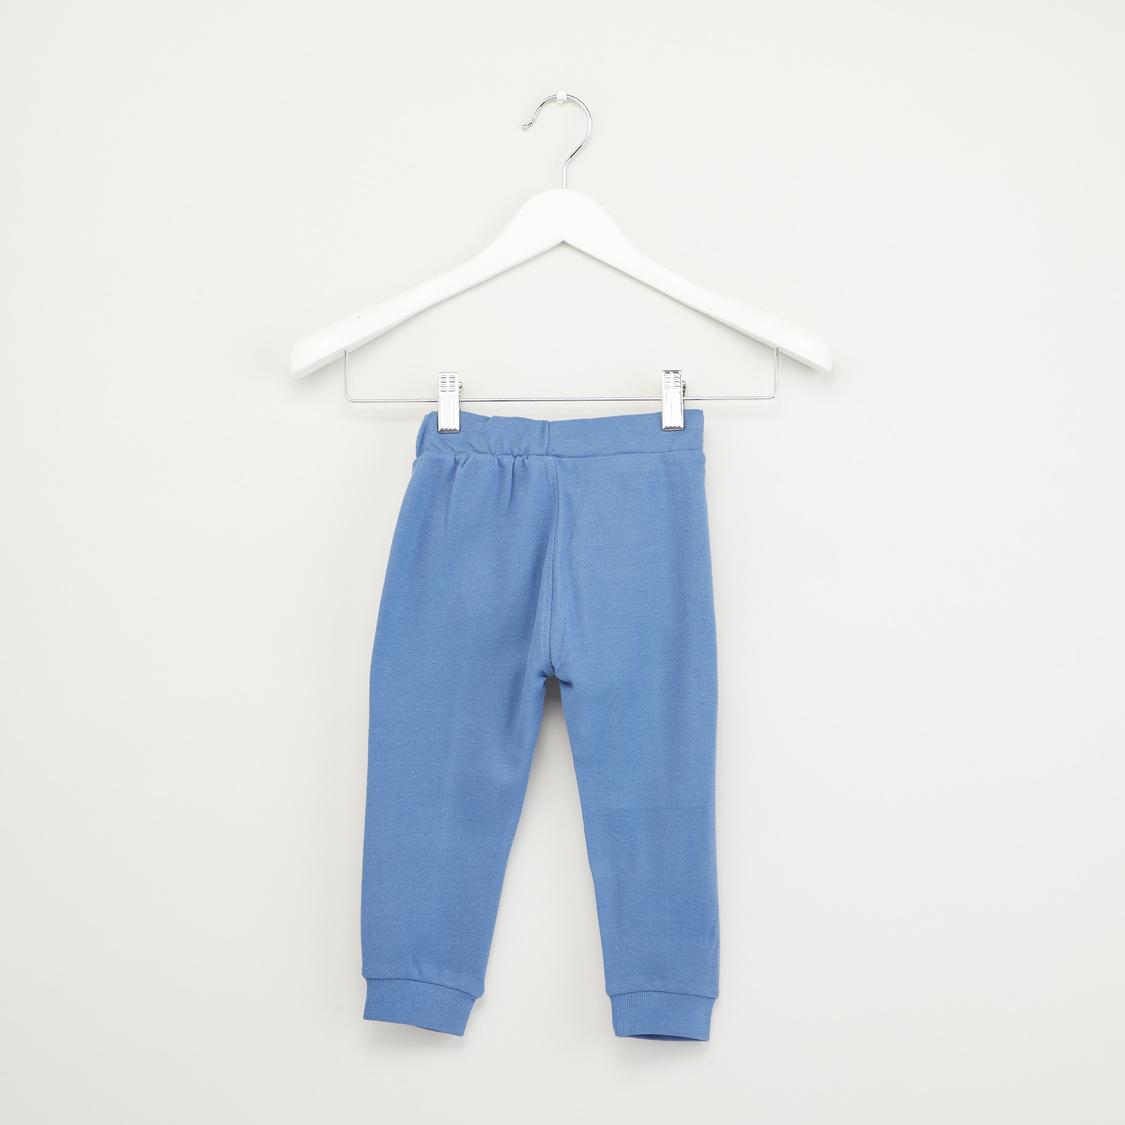 Full Length Plain Jog Pants with Pocket Detail and Drawstrings